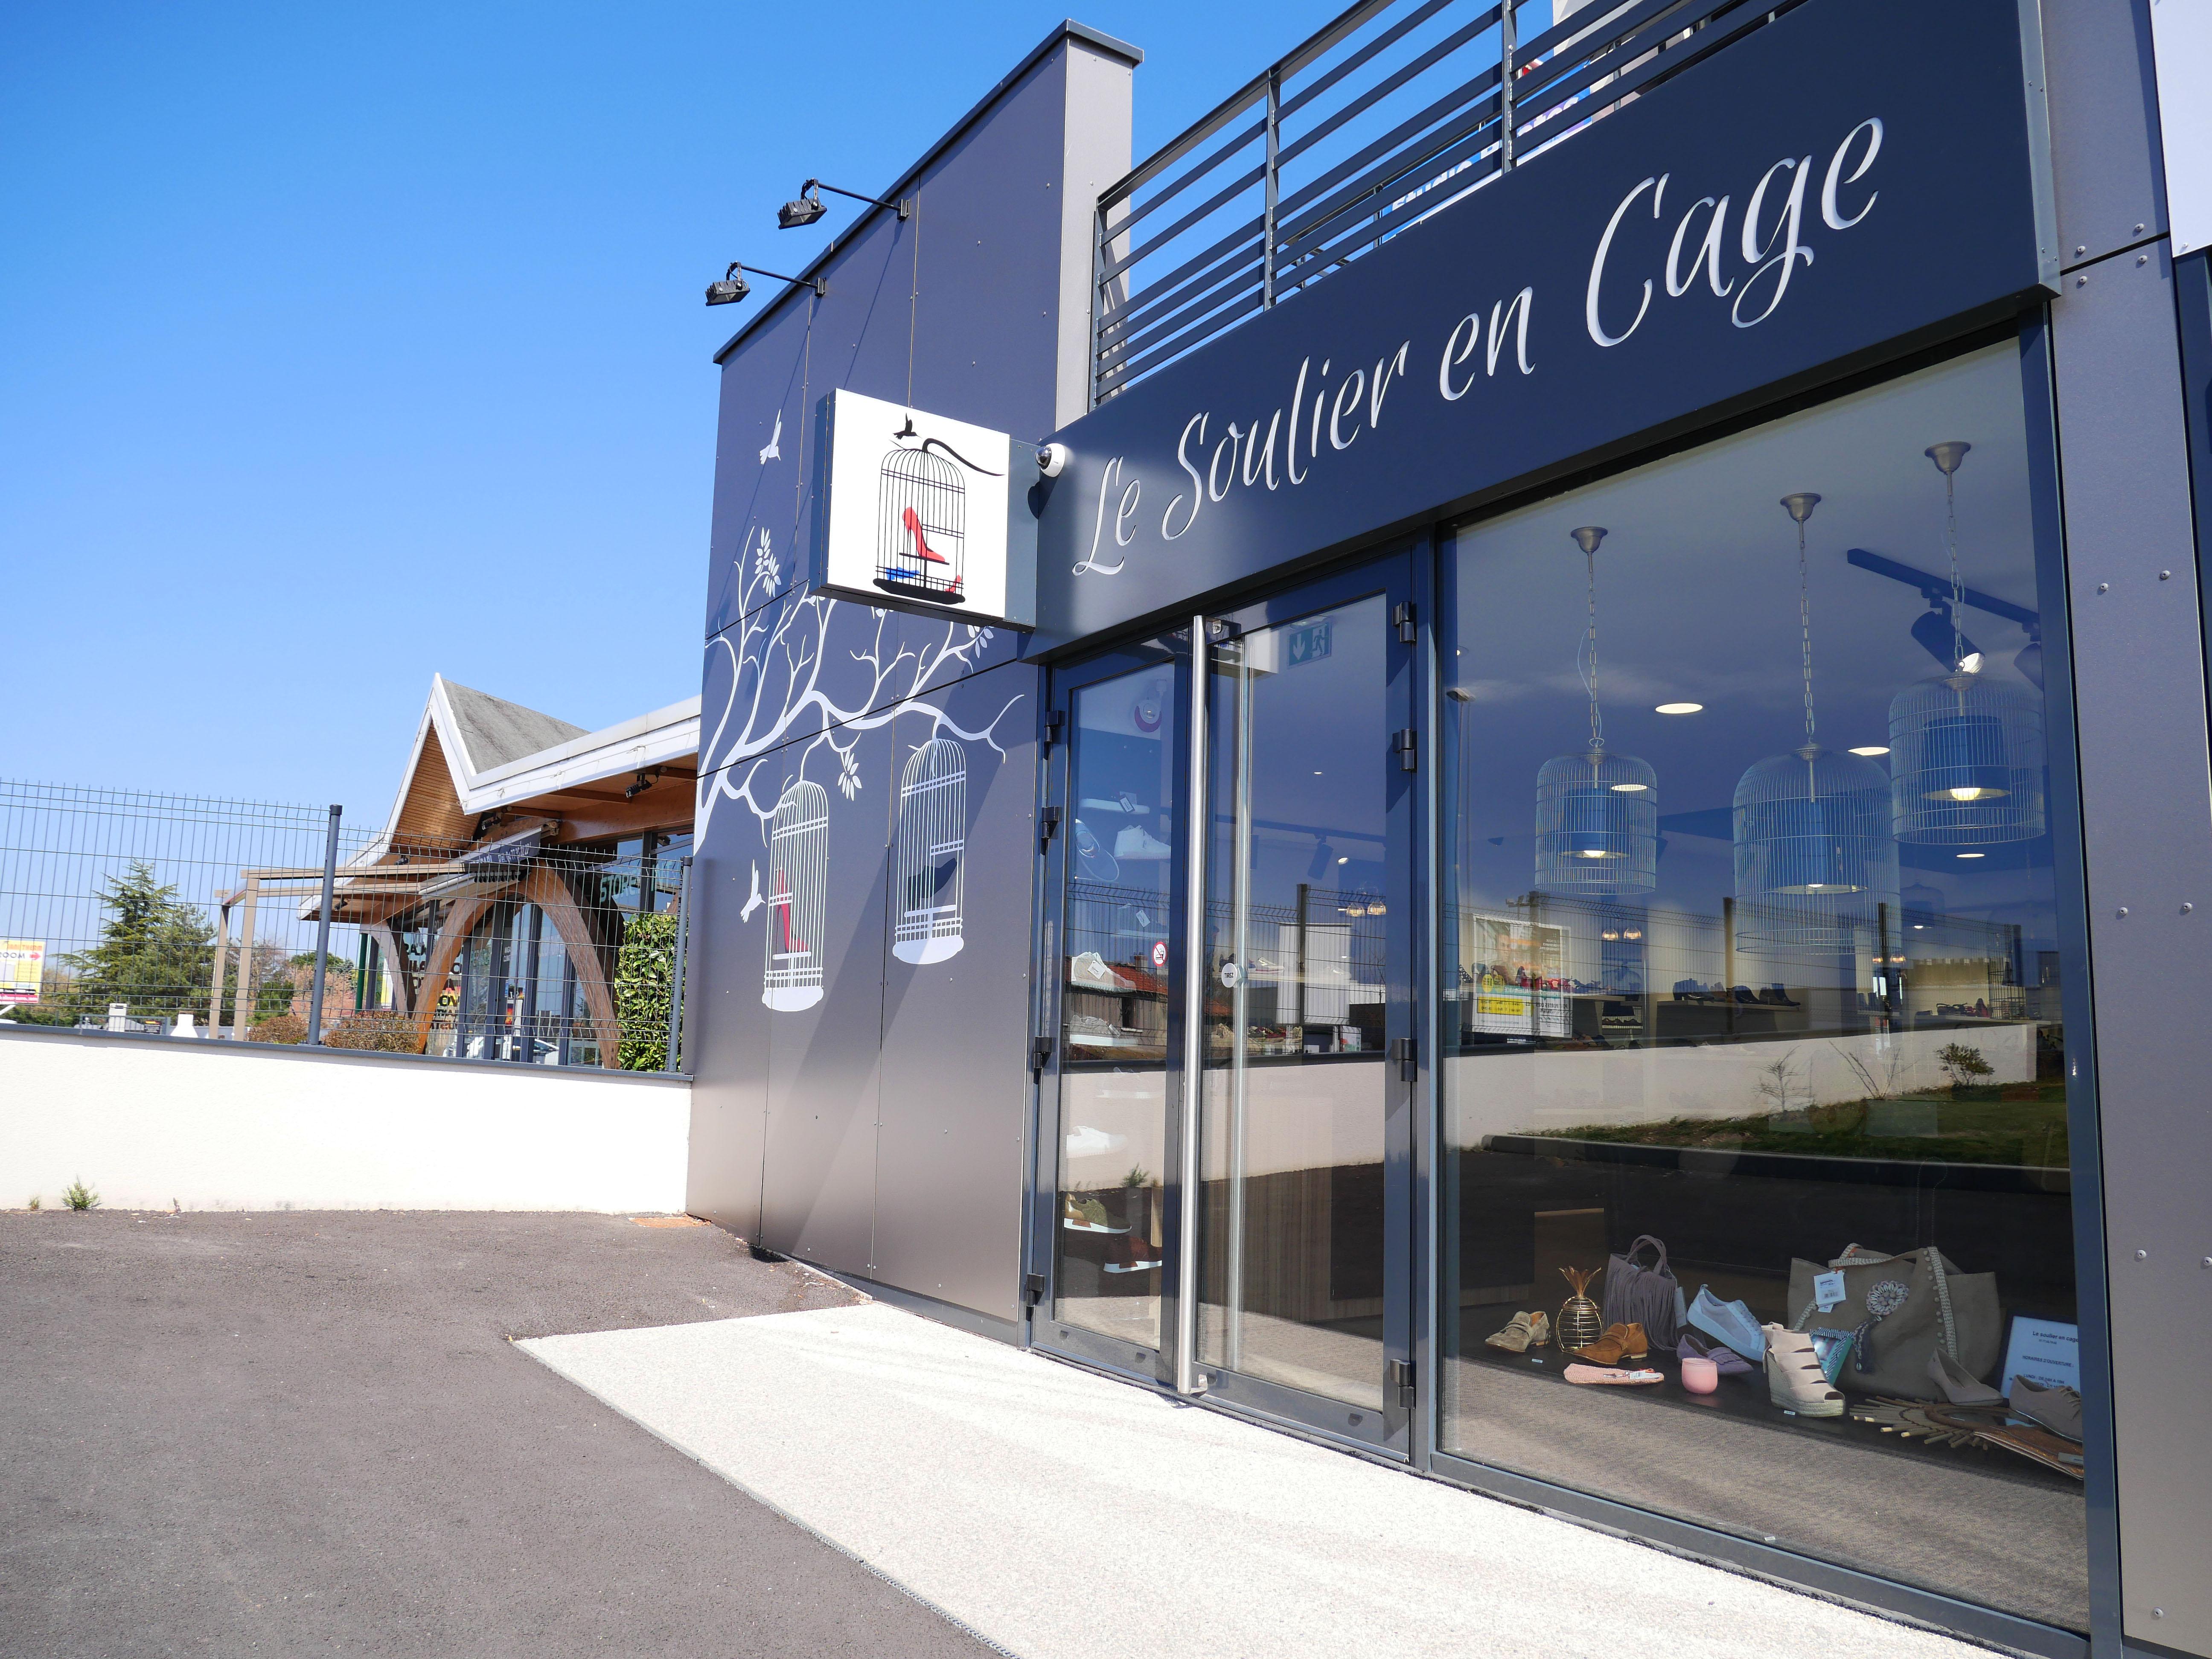 rbconcept-le-soulier-en-cage-facade-23